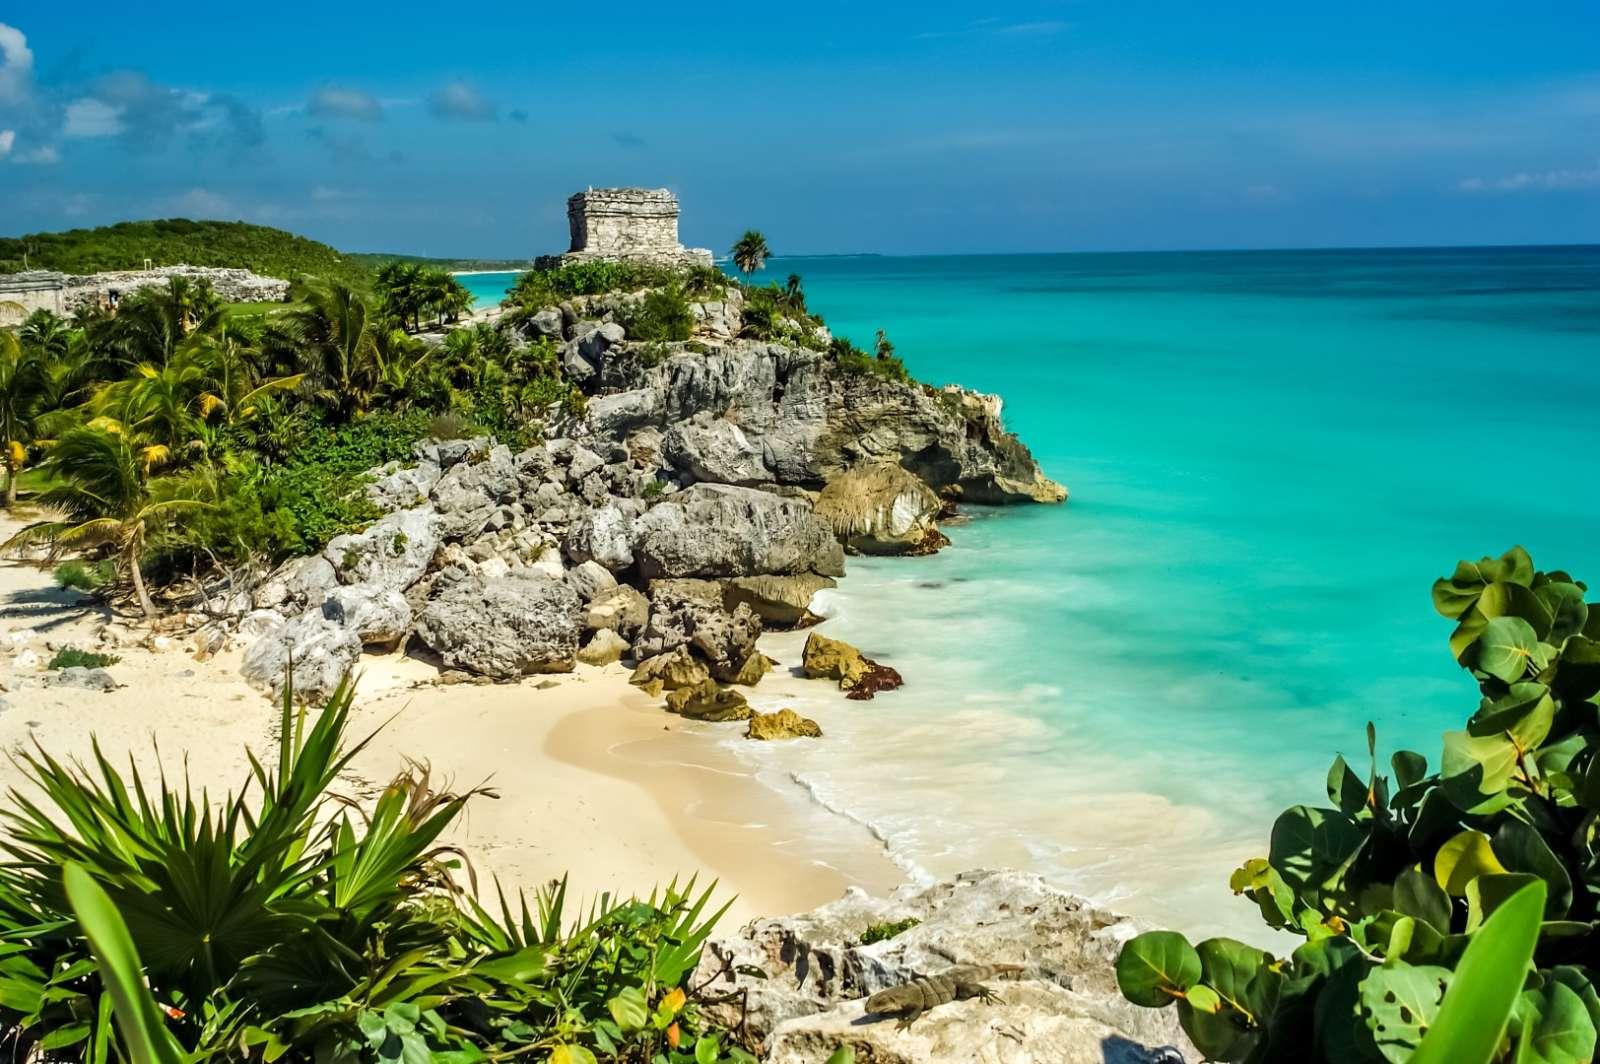 Tulum Mayan ruins and beach